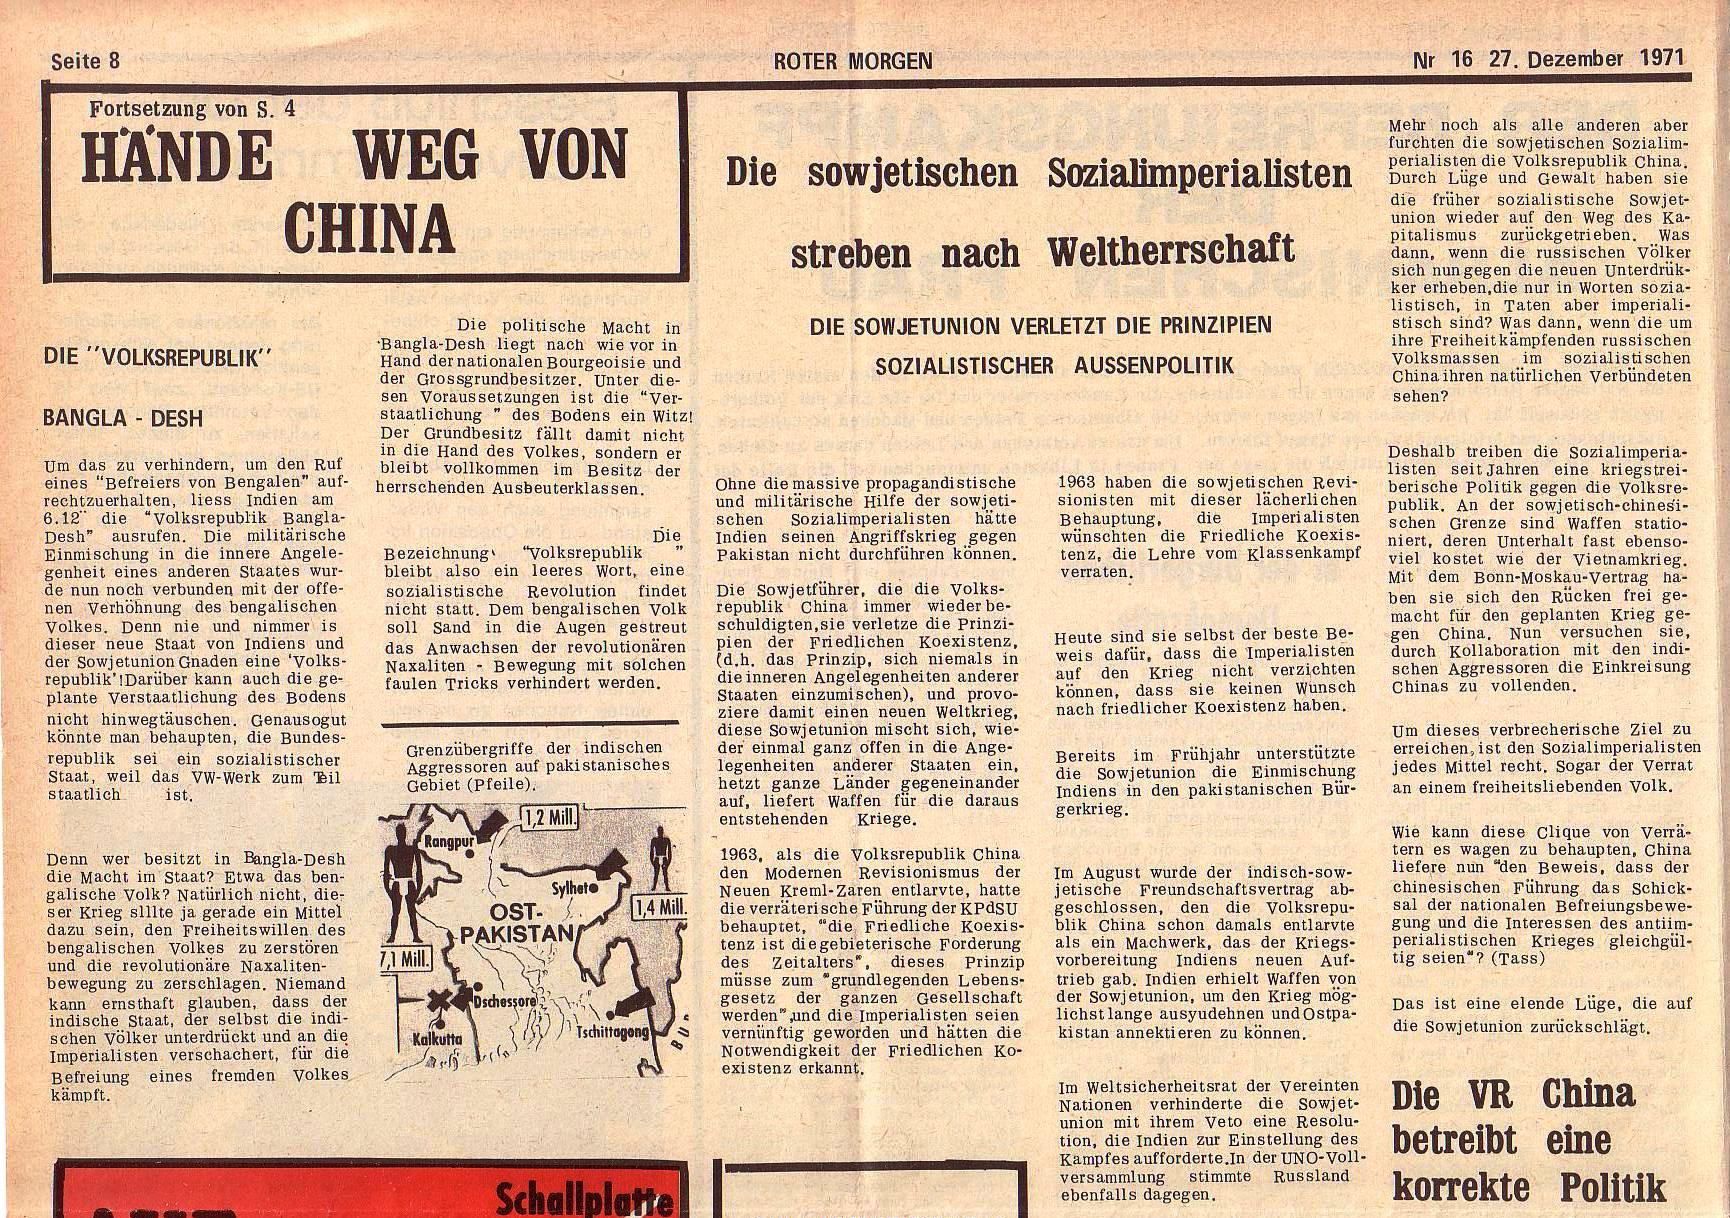 Roter Morgen, 5. Jg., 27. Dezember 1971, Nr. 16, Seite 8a